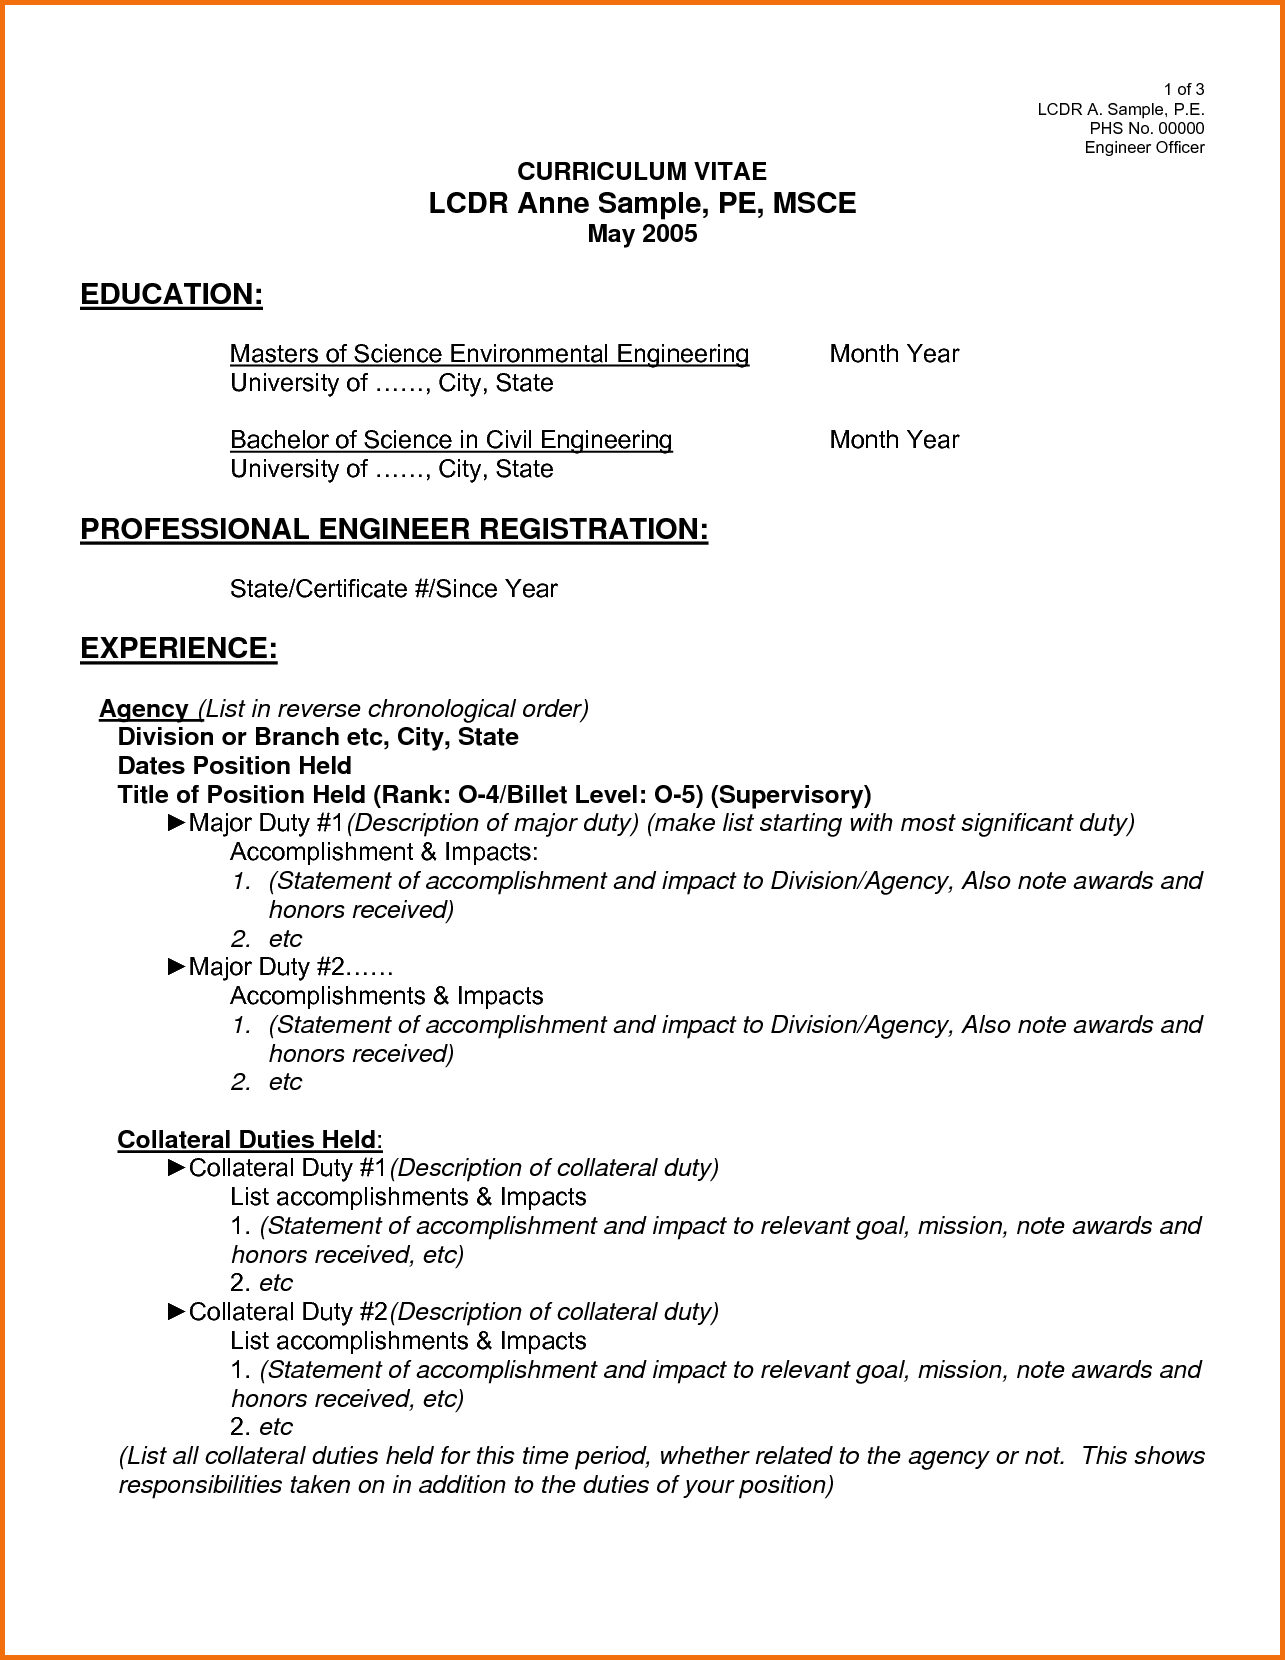 download format pdf curriculum vitae sample lawyer resume template ...